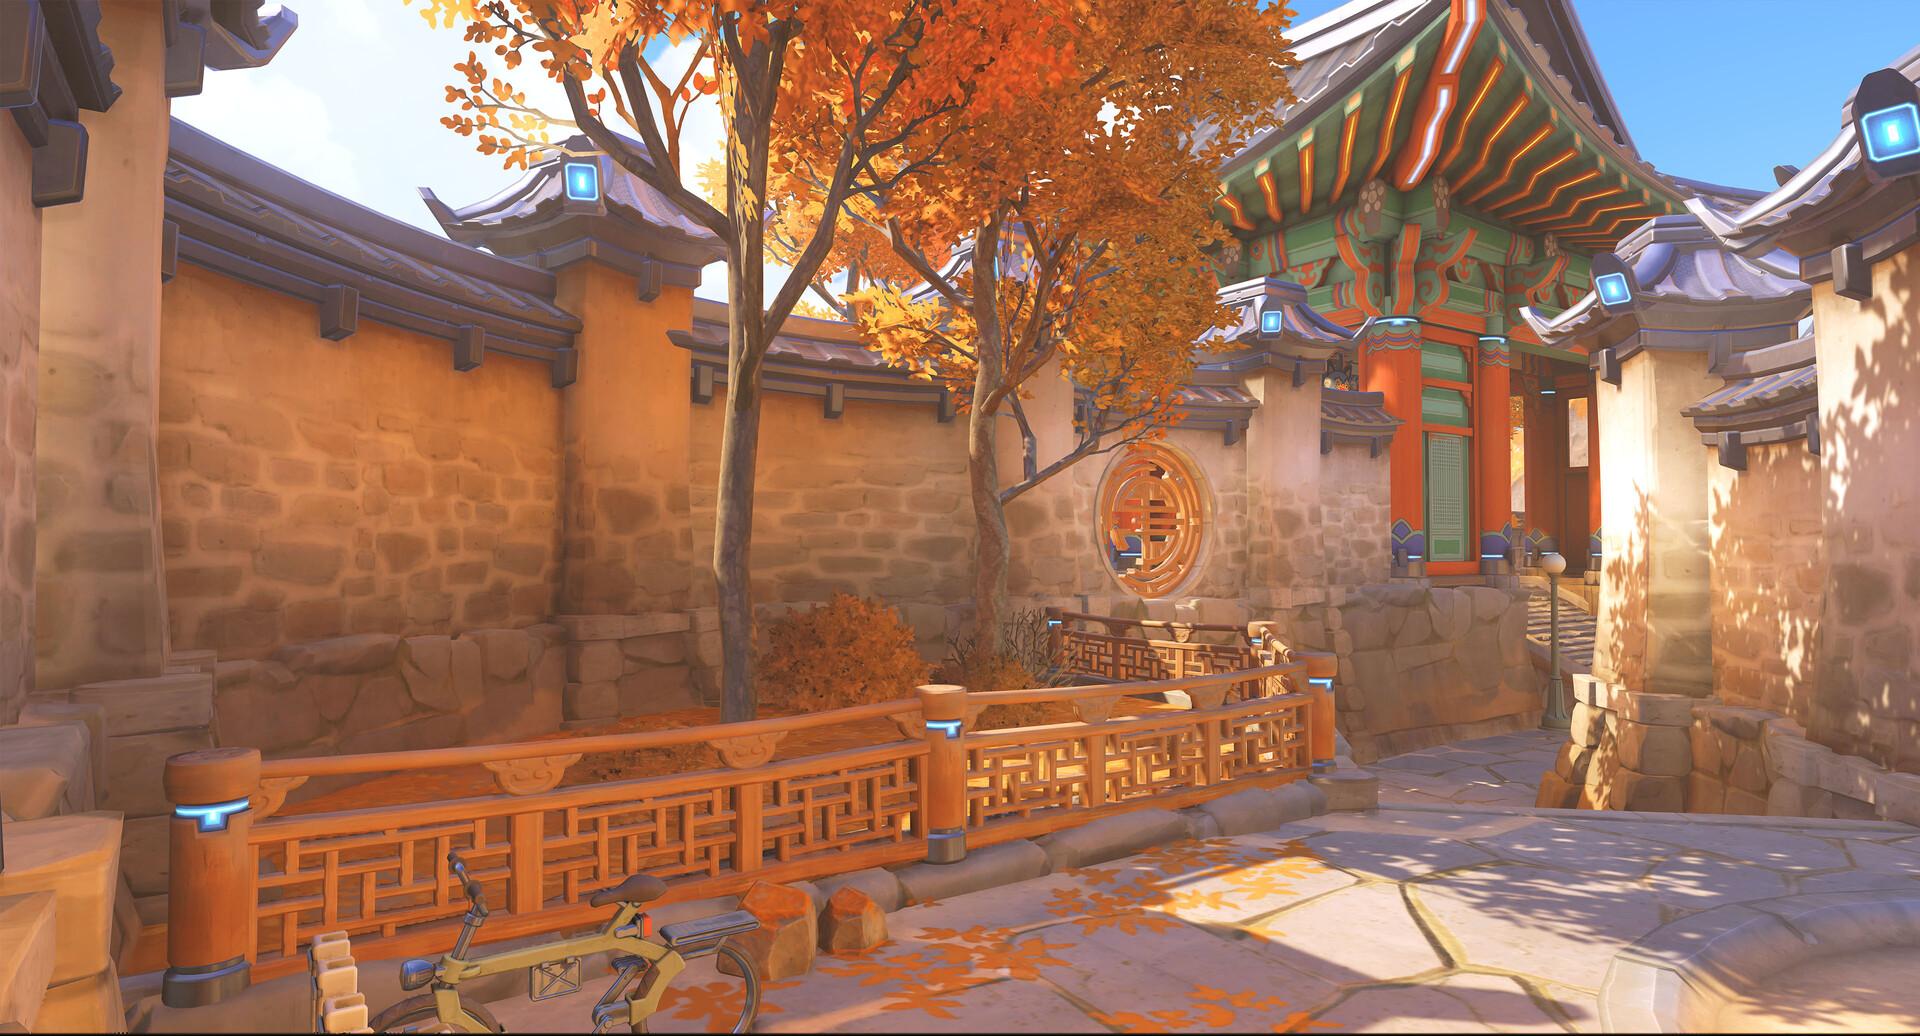 Helder pinto busan temple 14